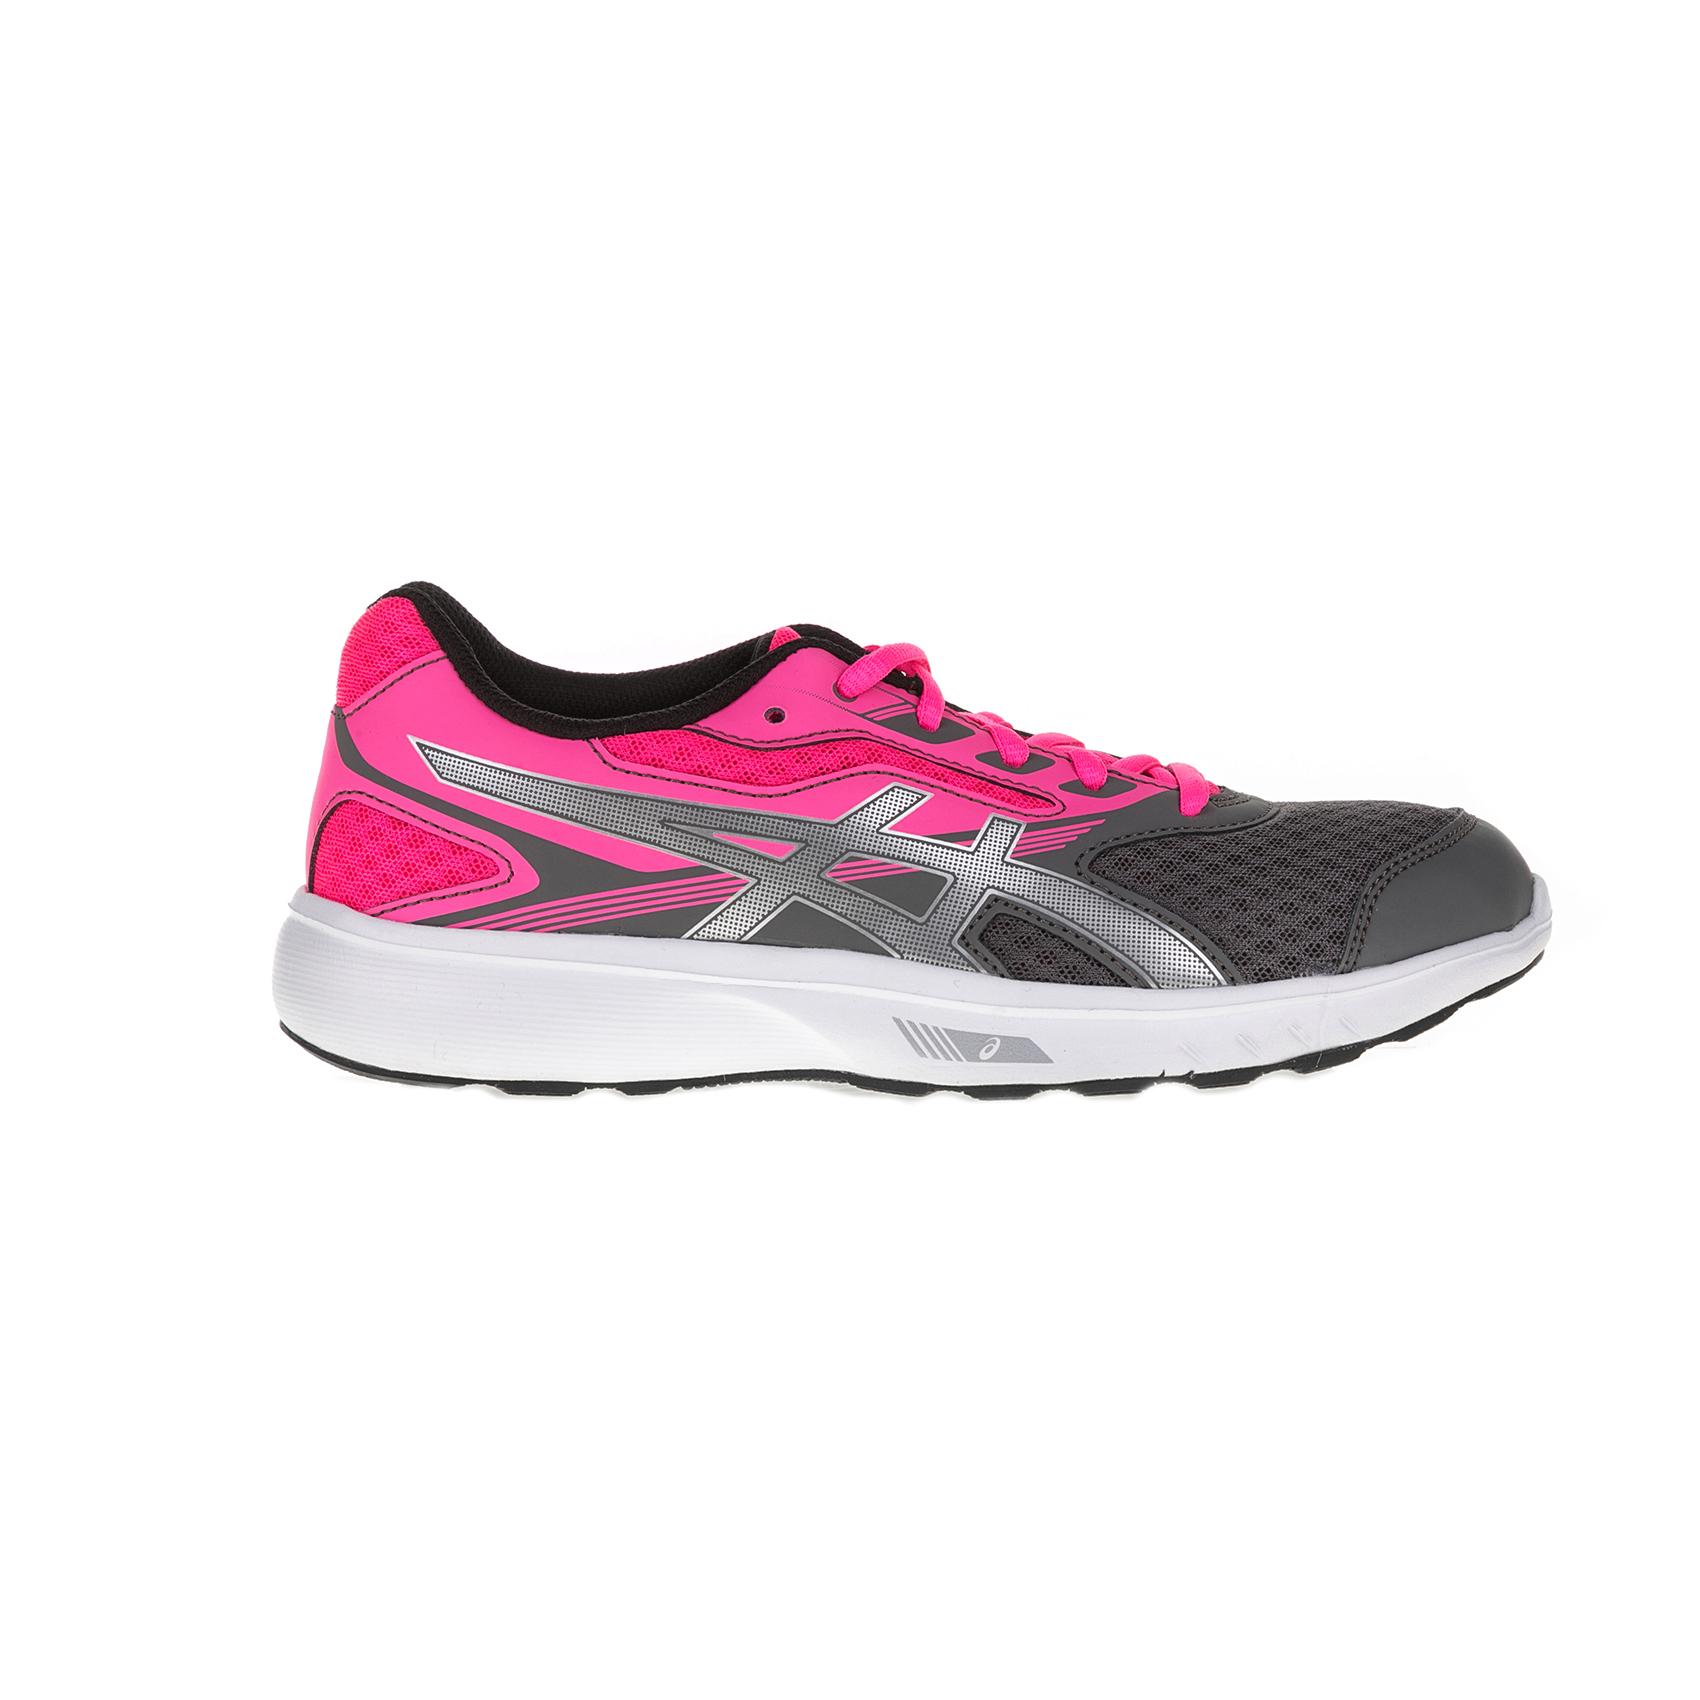 ASICS – Παιδικά αθλητικά παπούτσια ASICS STORMER GS γκρι-ροζ